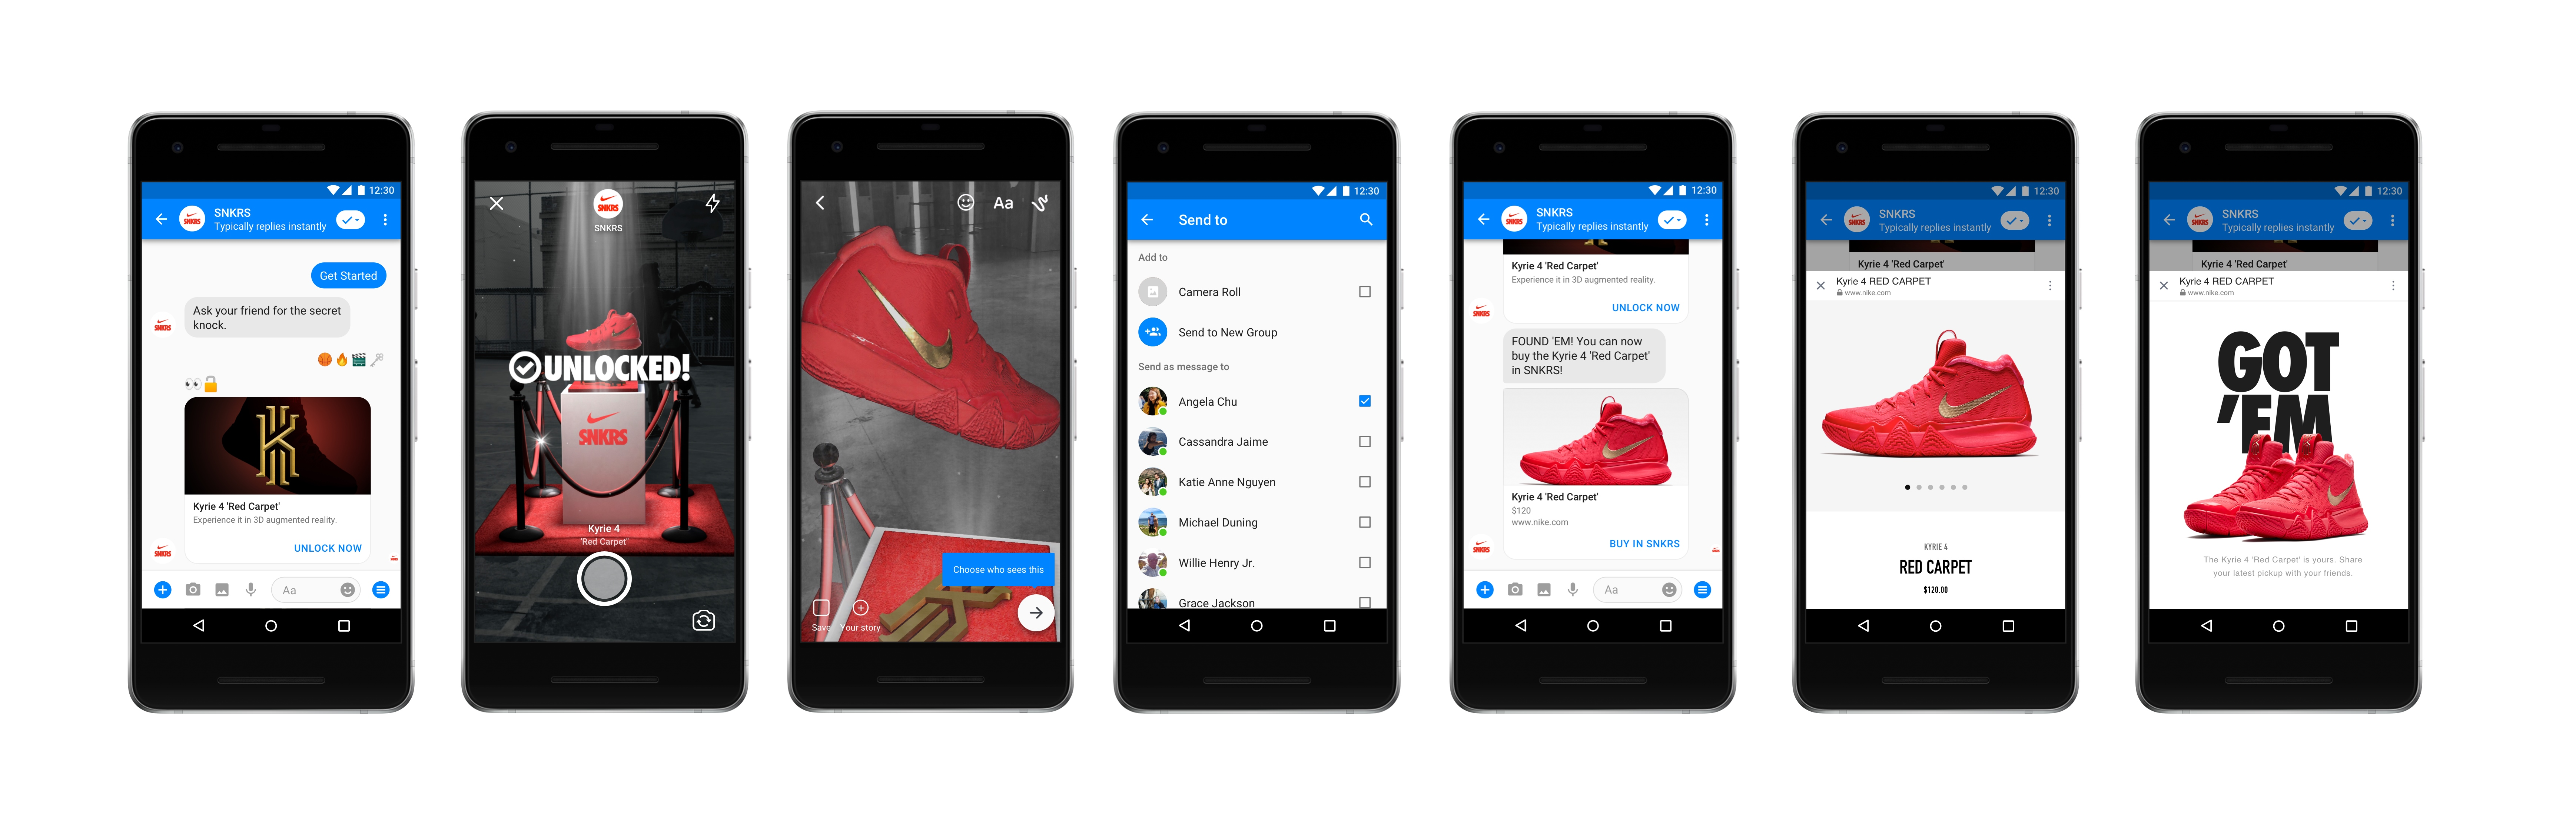 Facebook Messenger Platform Welcomes Augmented Reality – Adweek